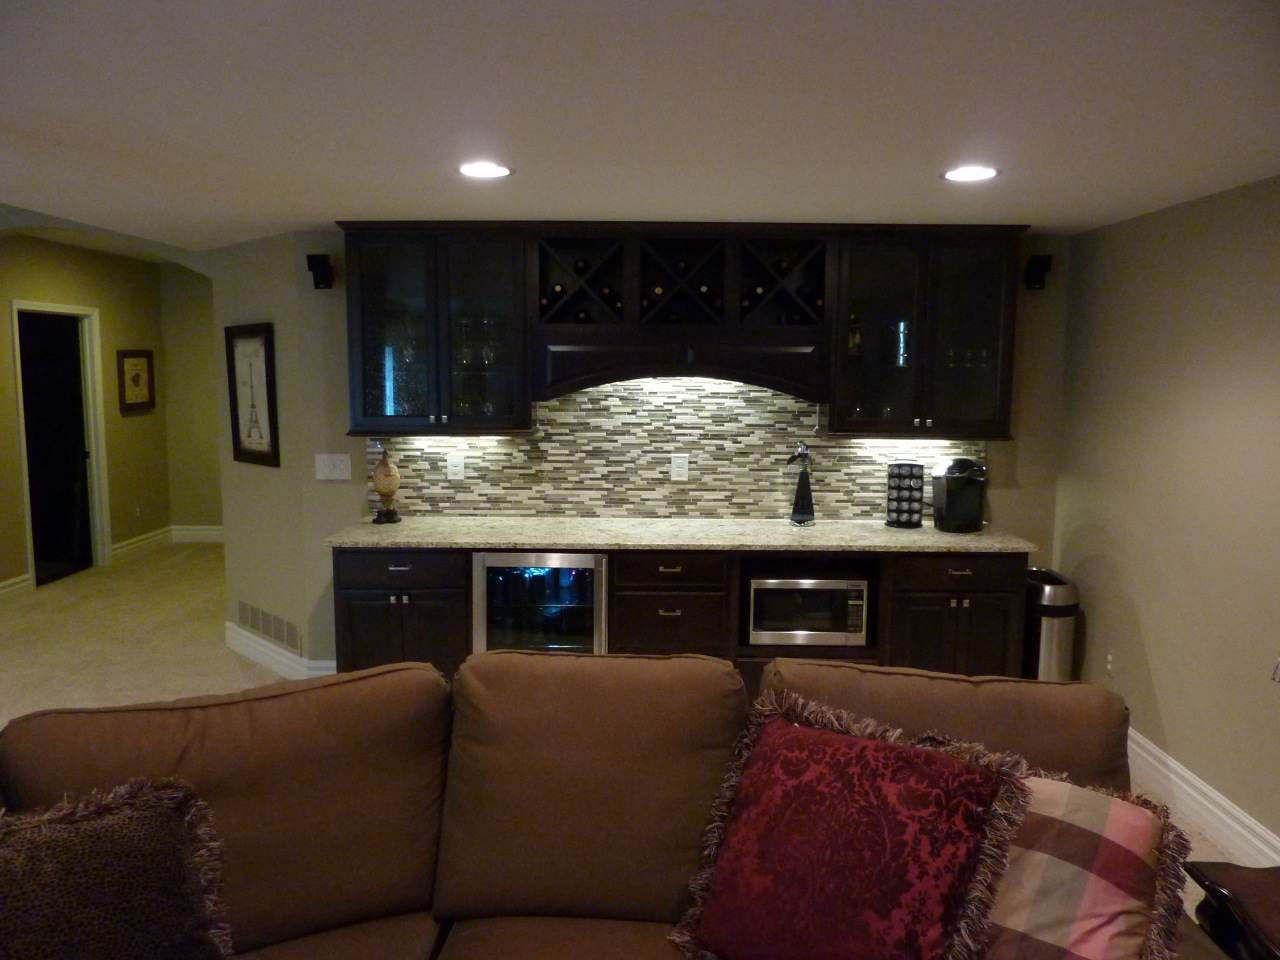 Finished Basement Designs | ... , Basement Family Room Finishing Ideas:  Basement Finishing